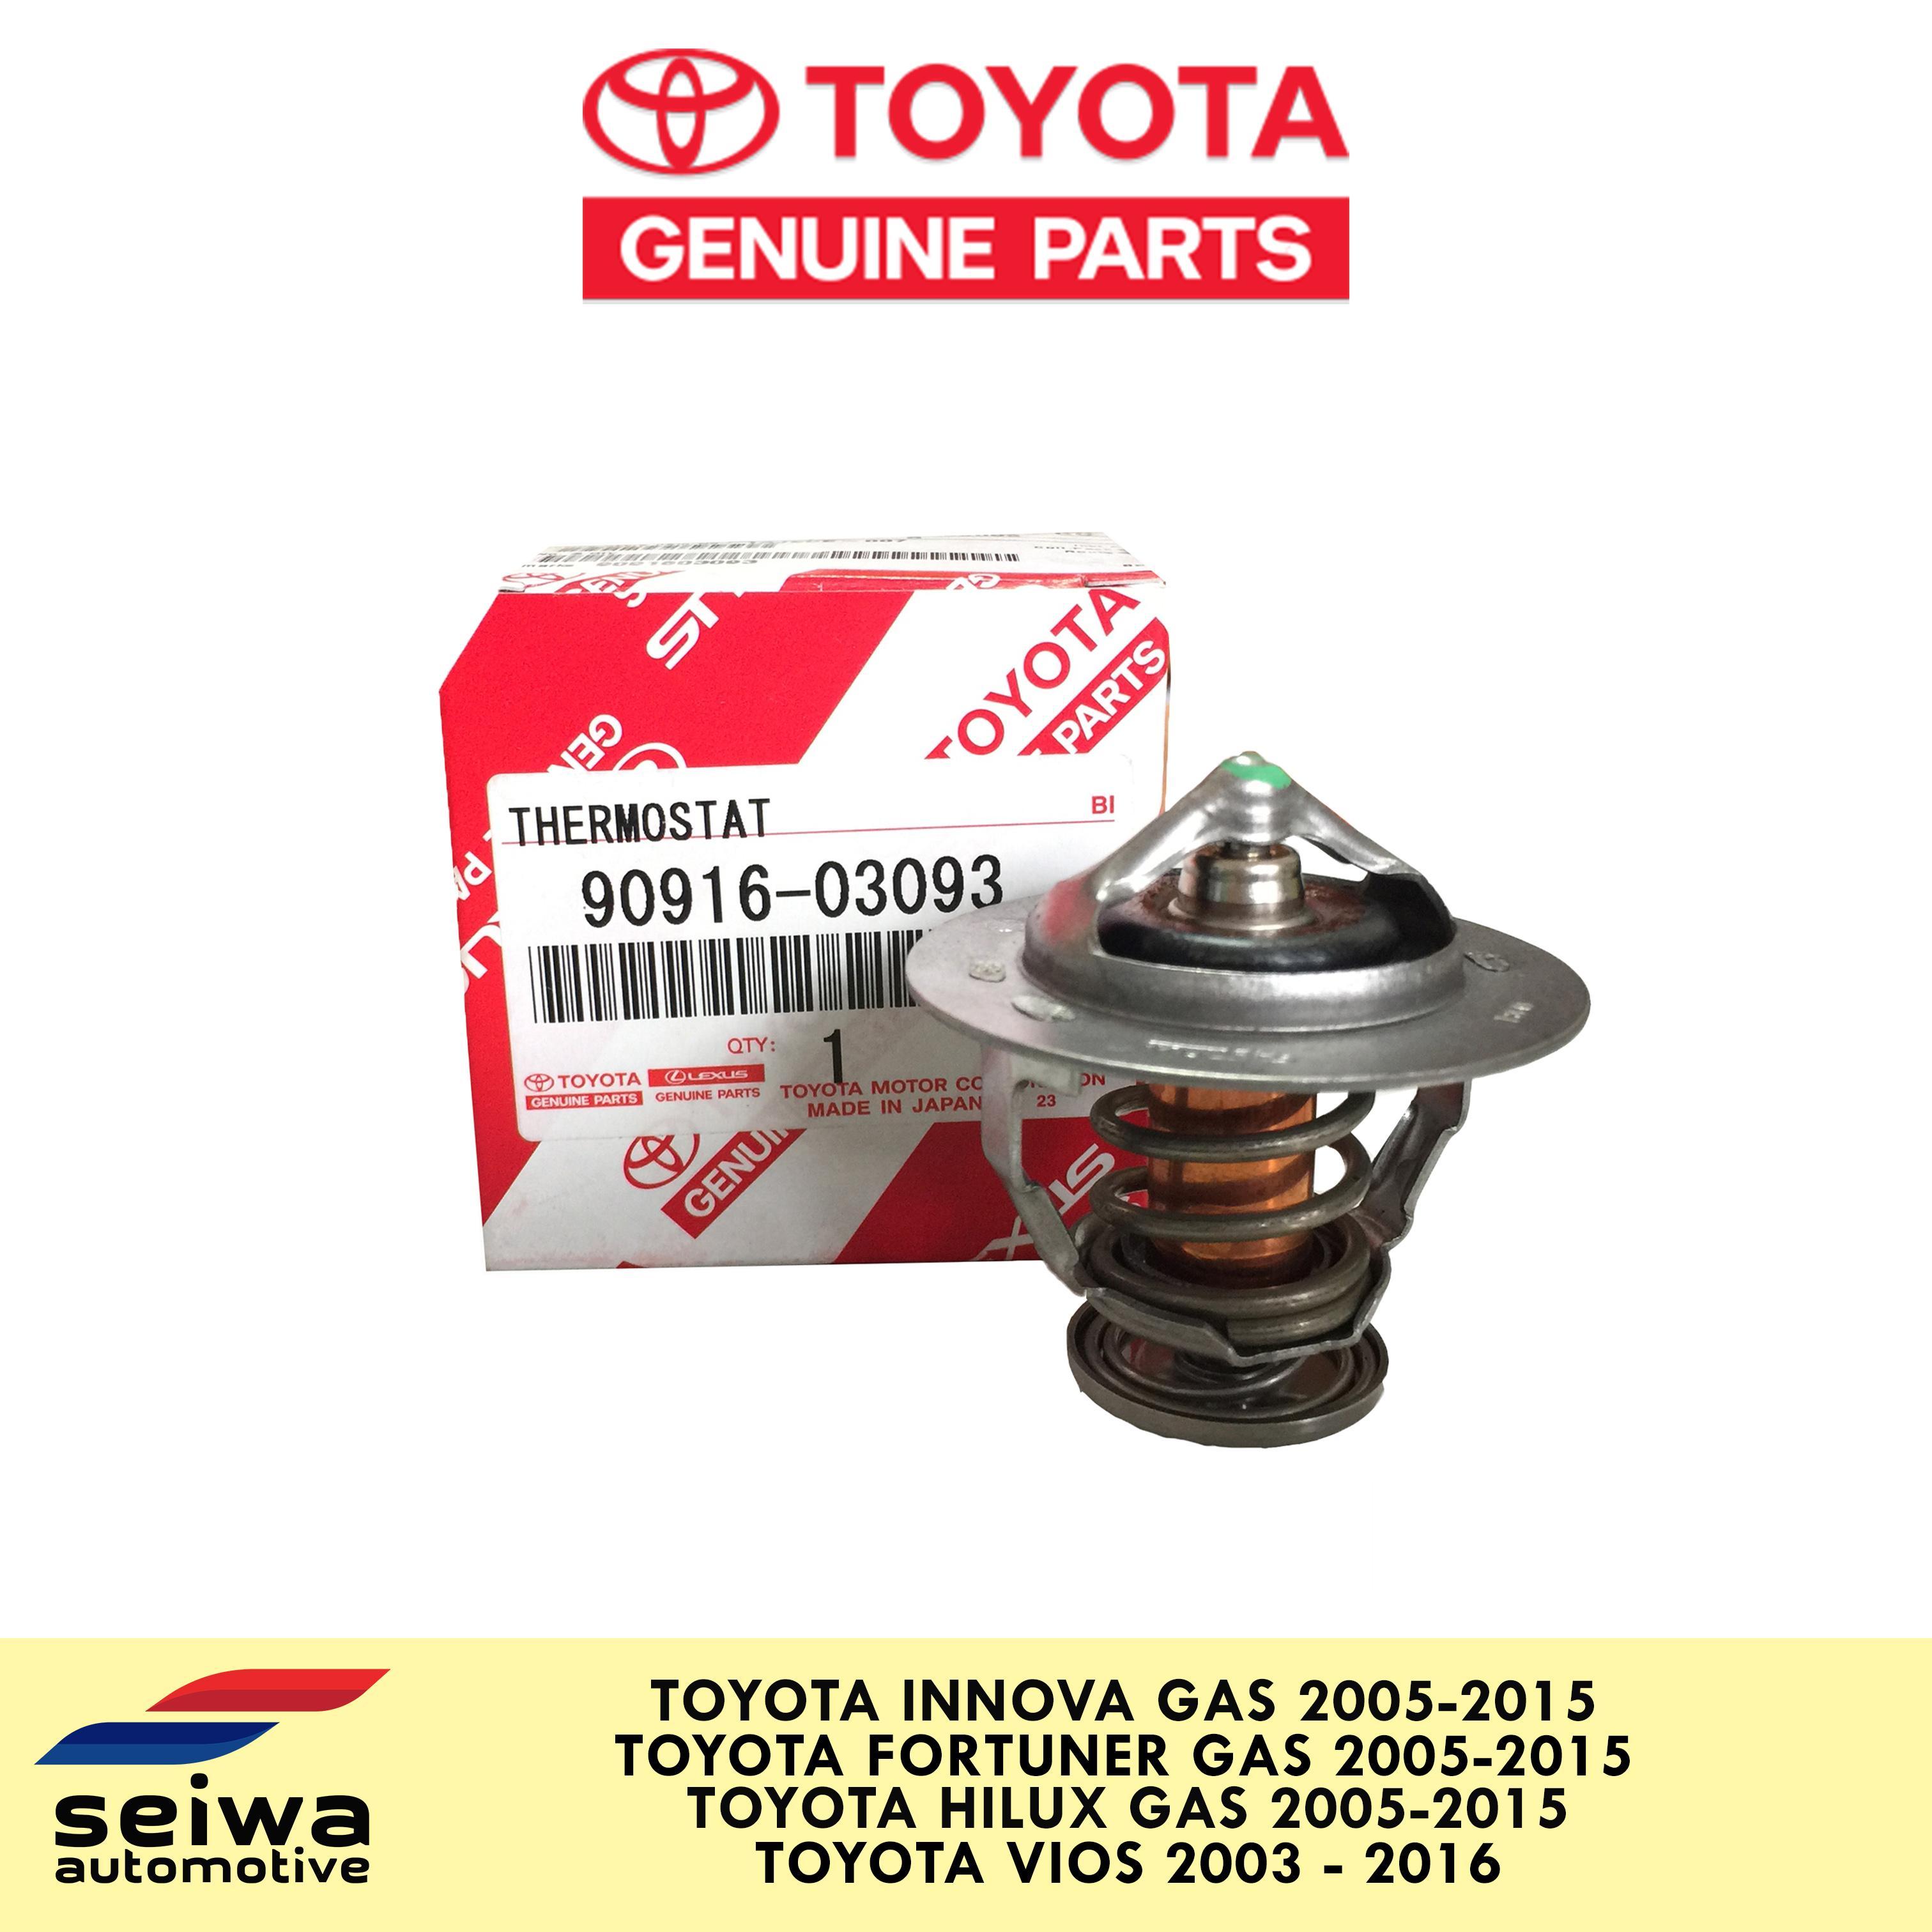 Toyota Innova Gas Thermostat - Toyota Fortuner Gas Thermostat - Toyota Vios  Thermostat - Toyota Yaris Thermostat - Genuine Toyota Auto Parts -